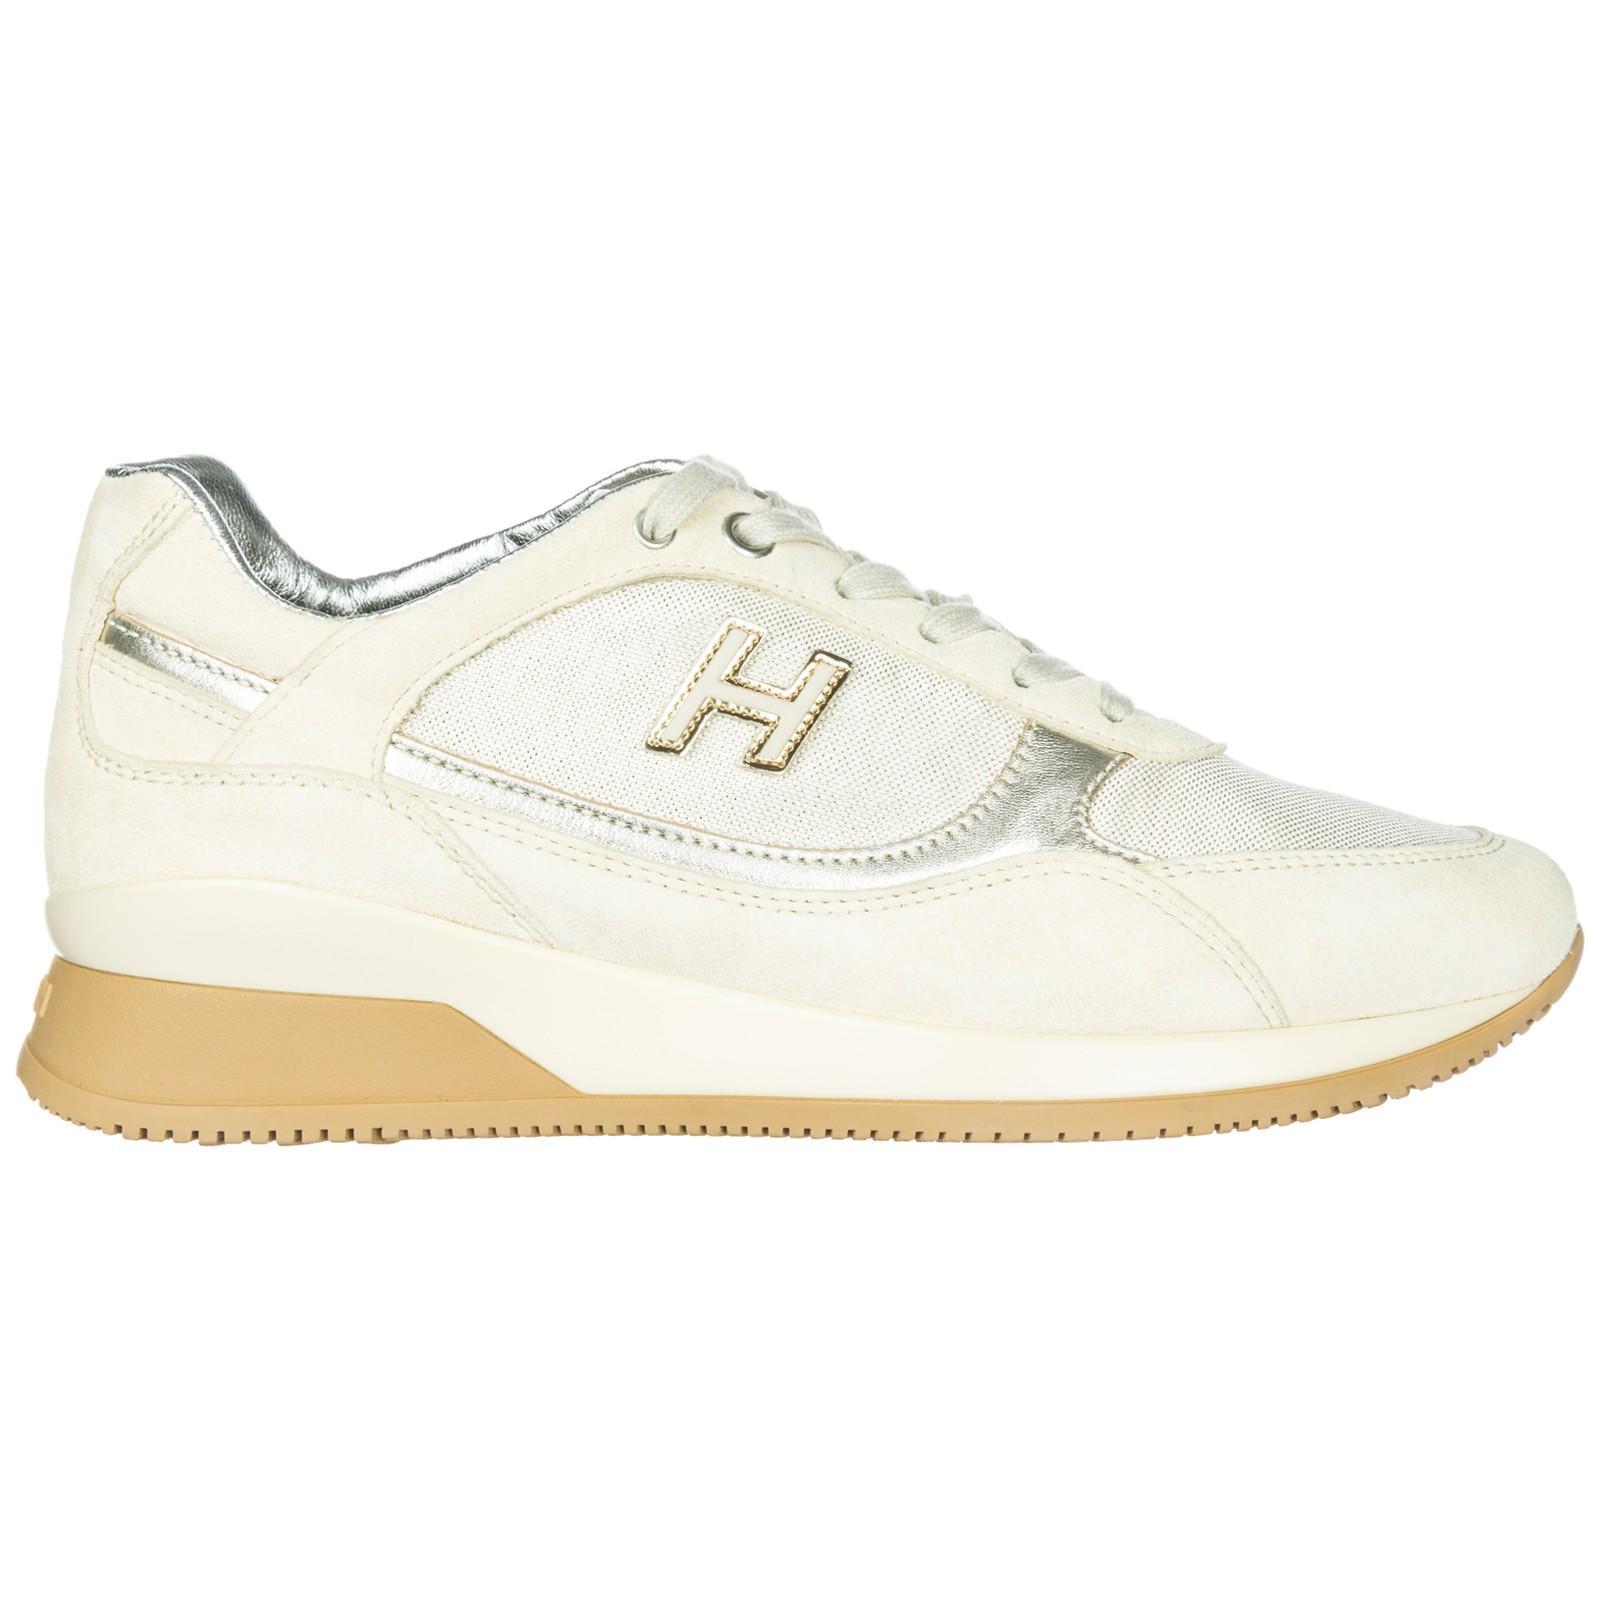 Hogan Damenschuhe Turnschuhe Damen Wildleder Schuhe Sneakers ...